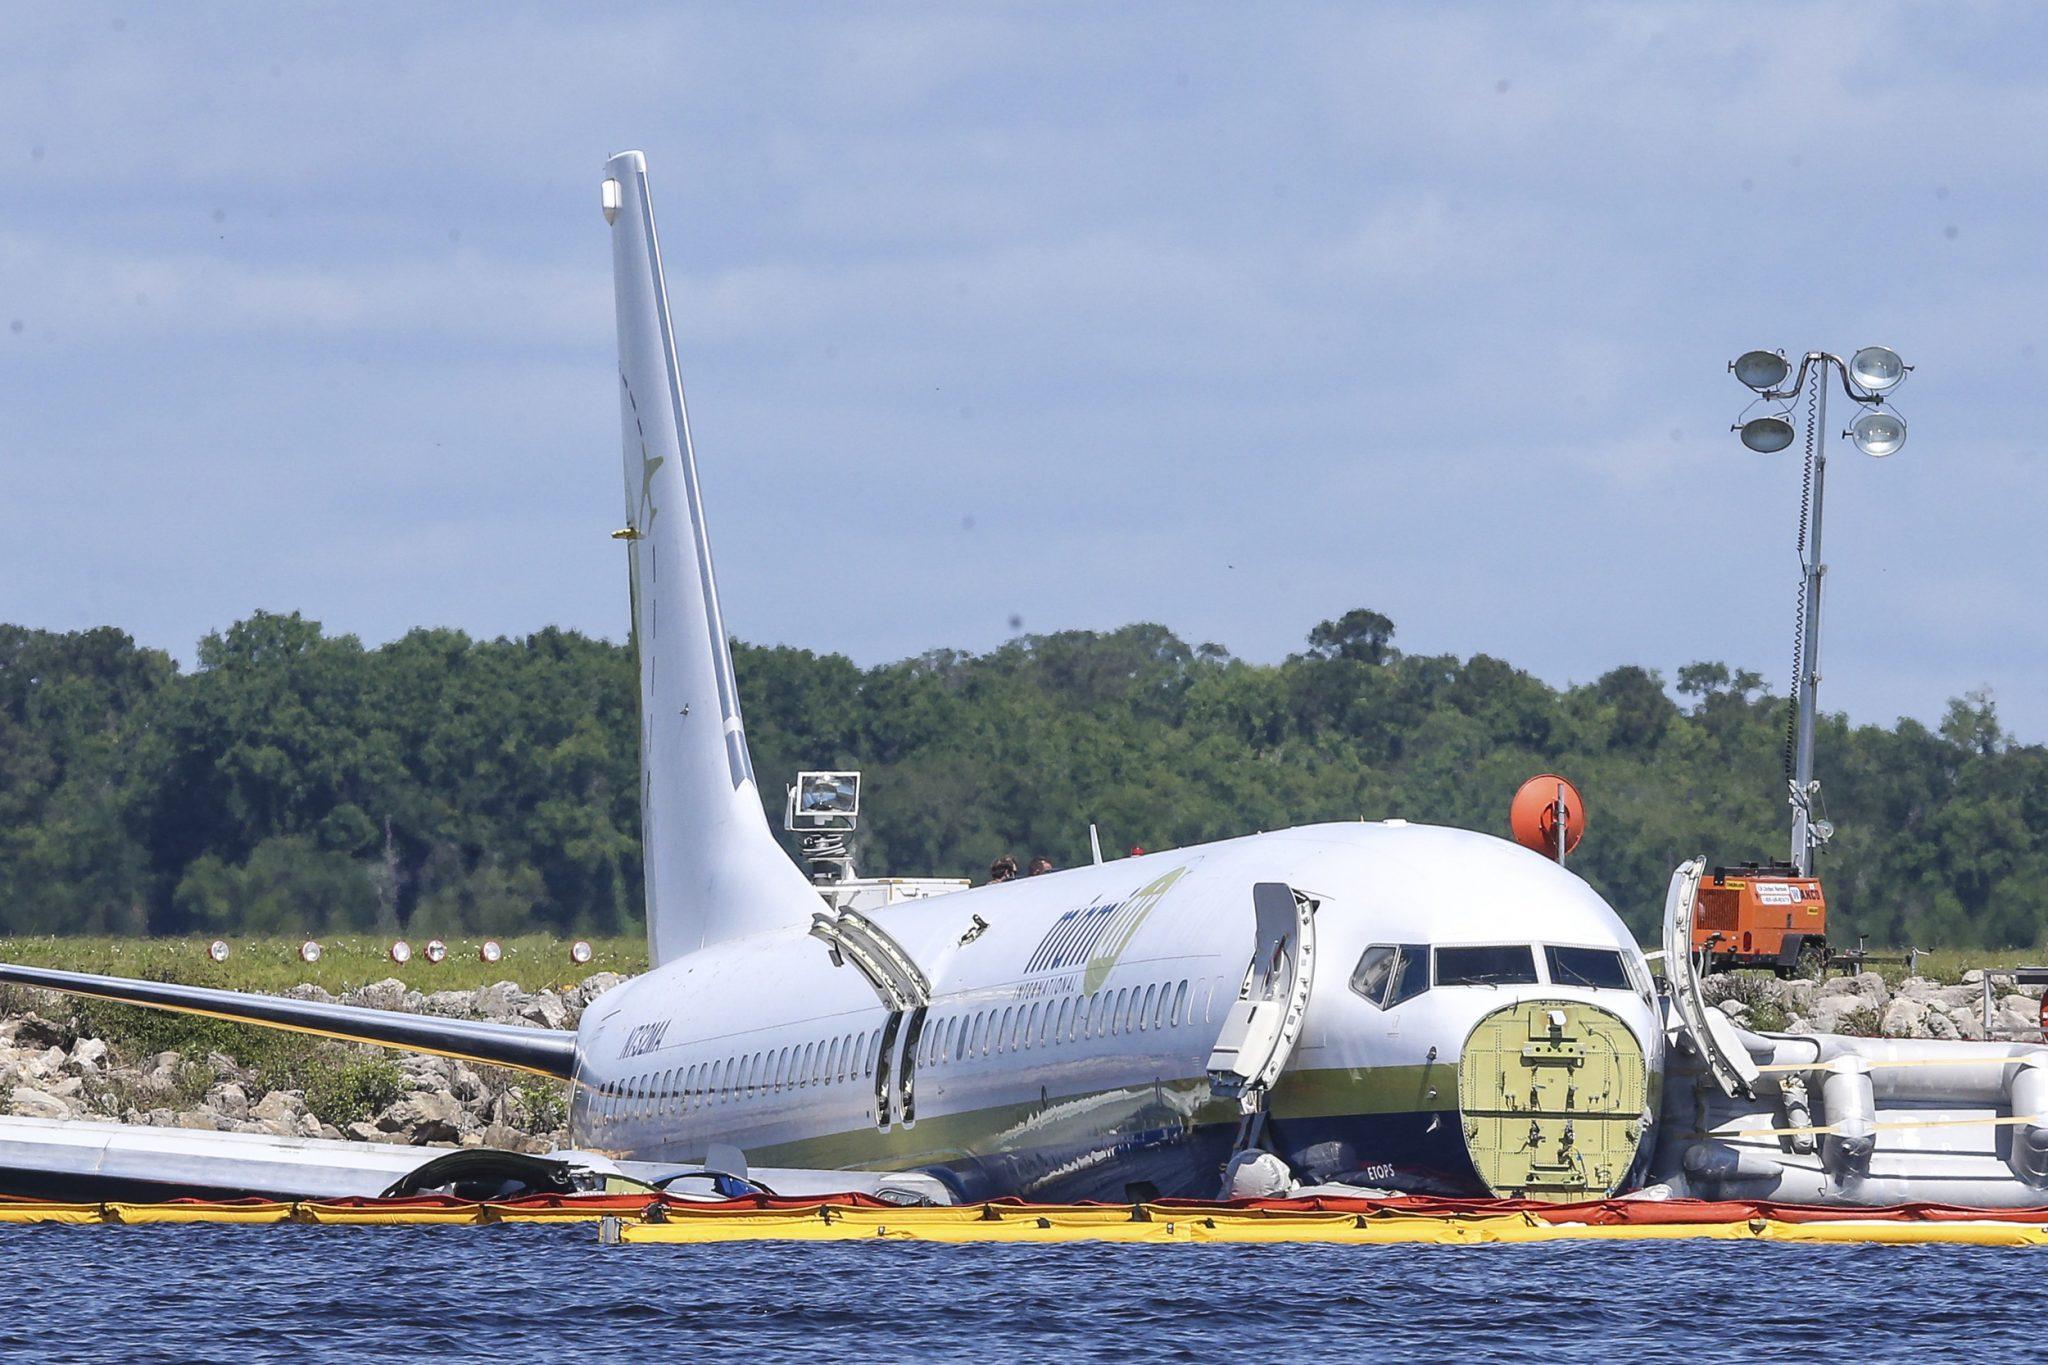 Pilots made runway change before jet hit Florida river